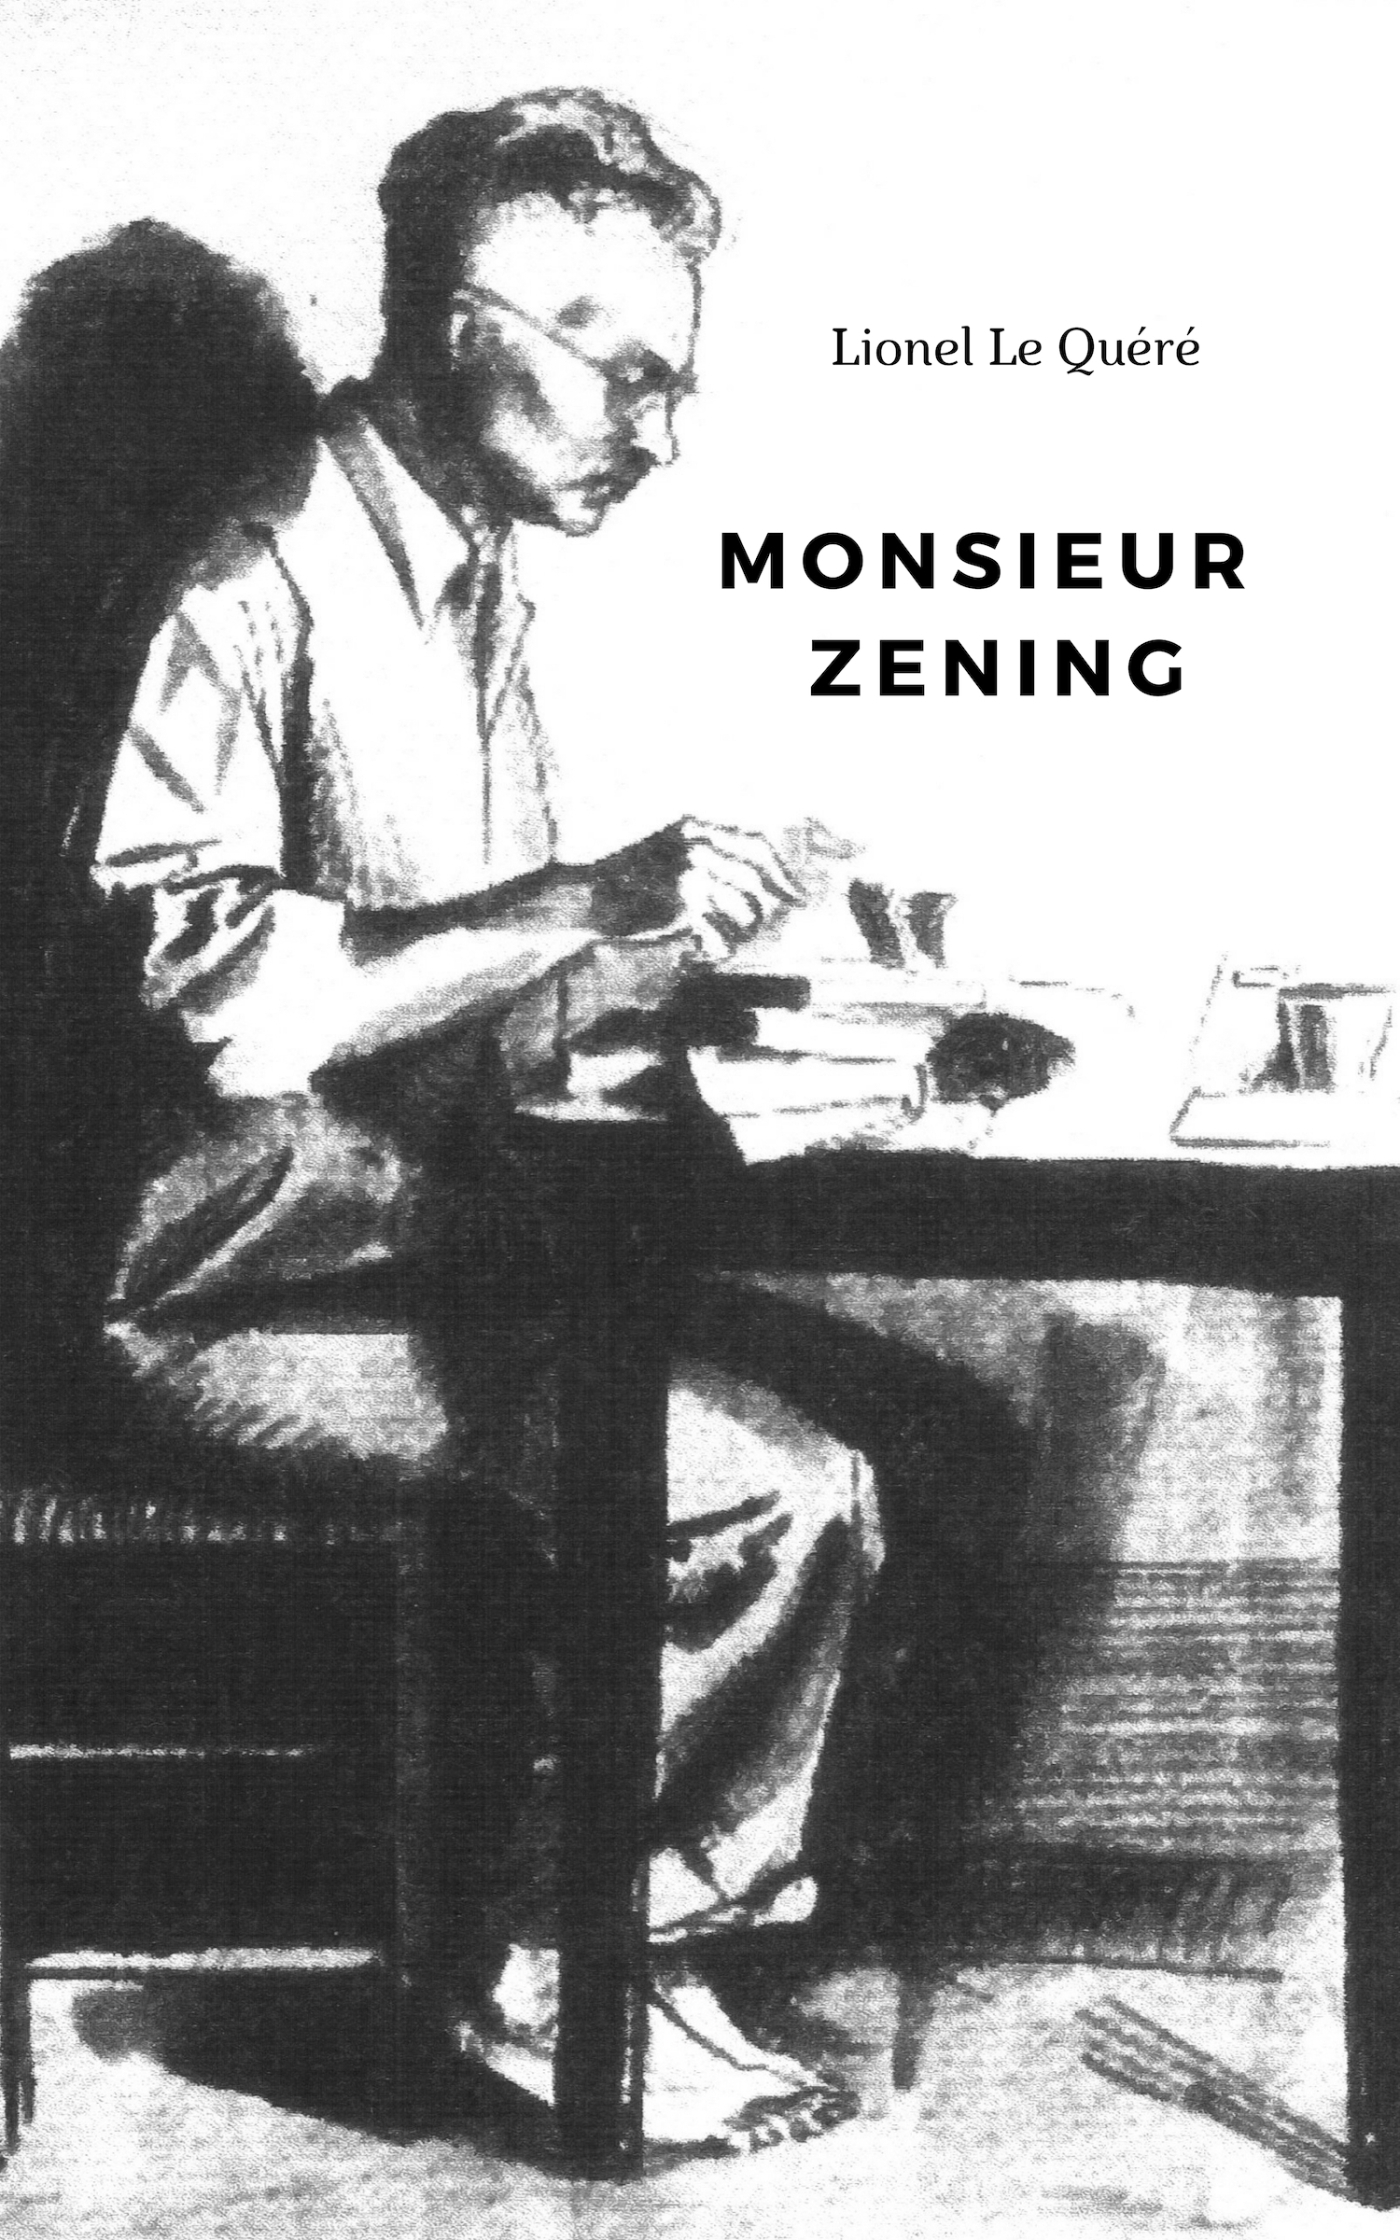 MONSIEUR ZENING